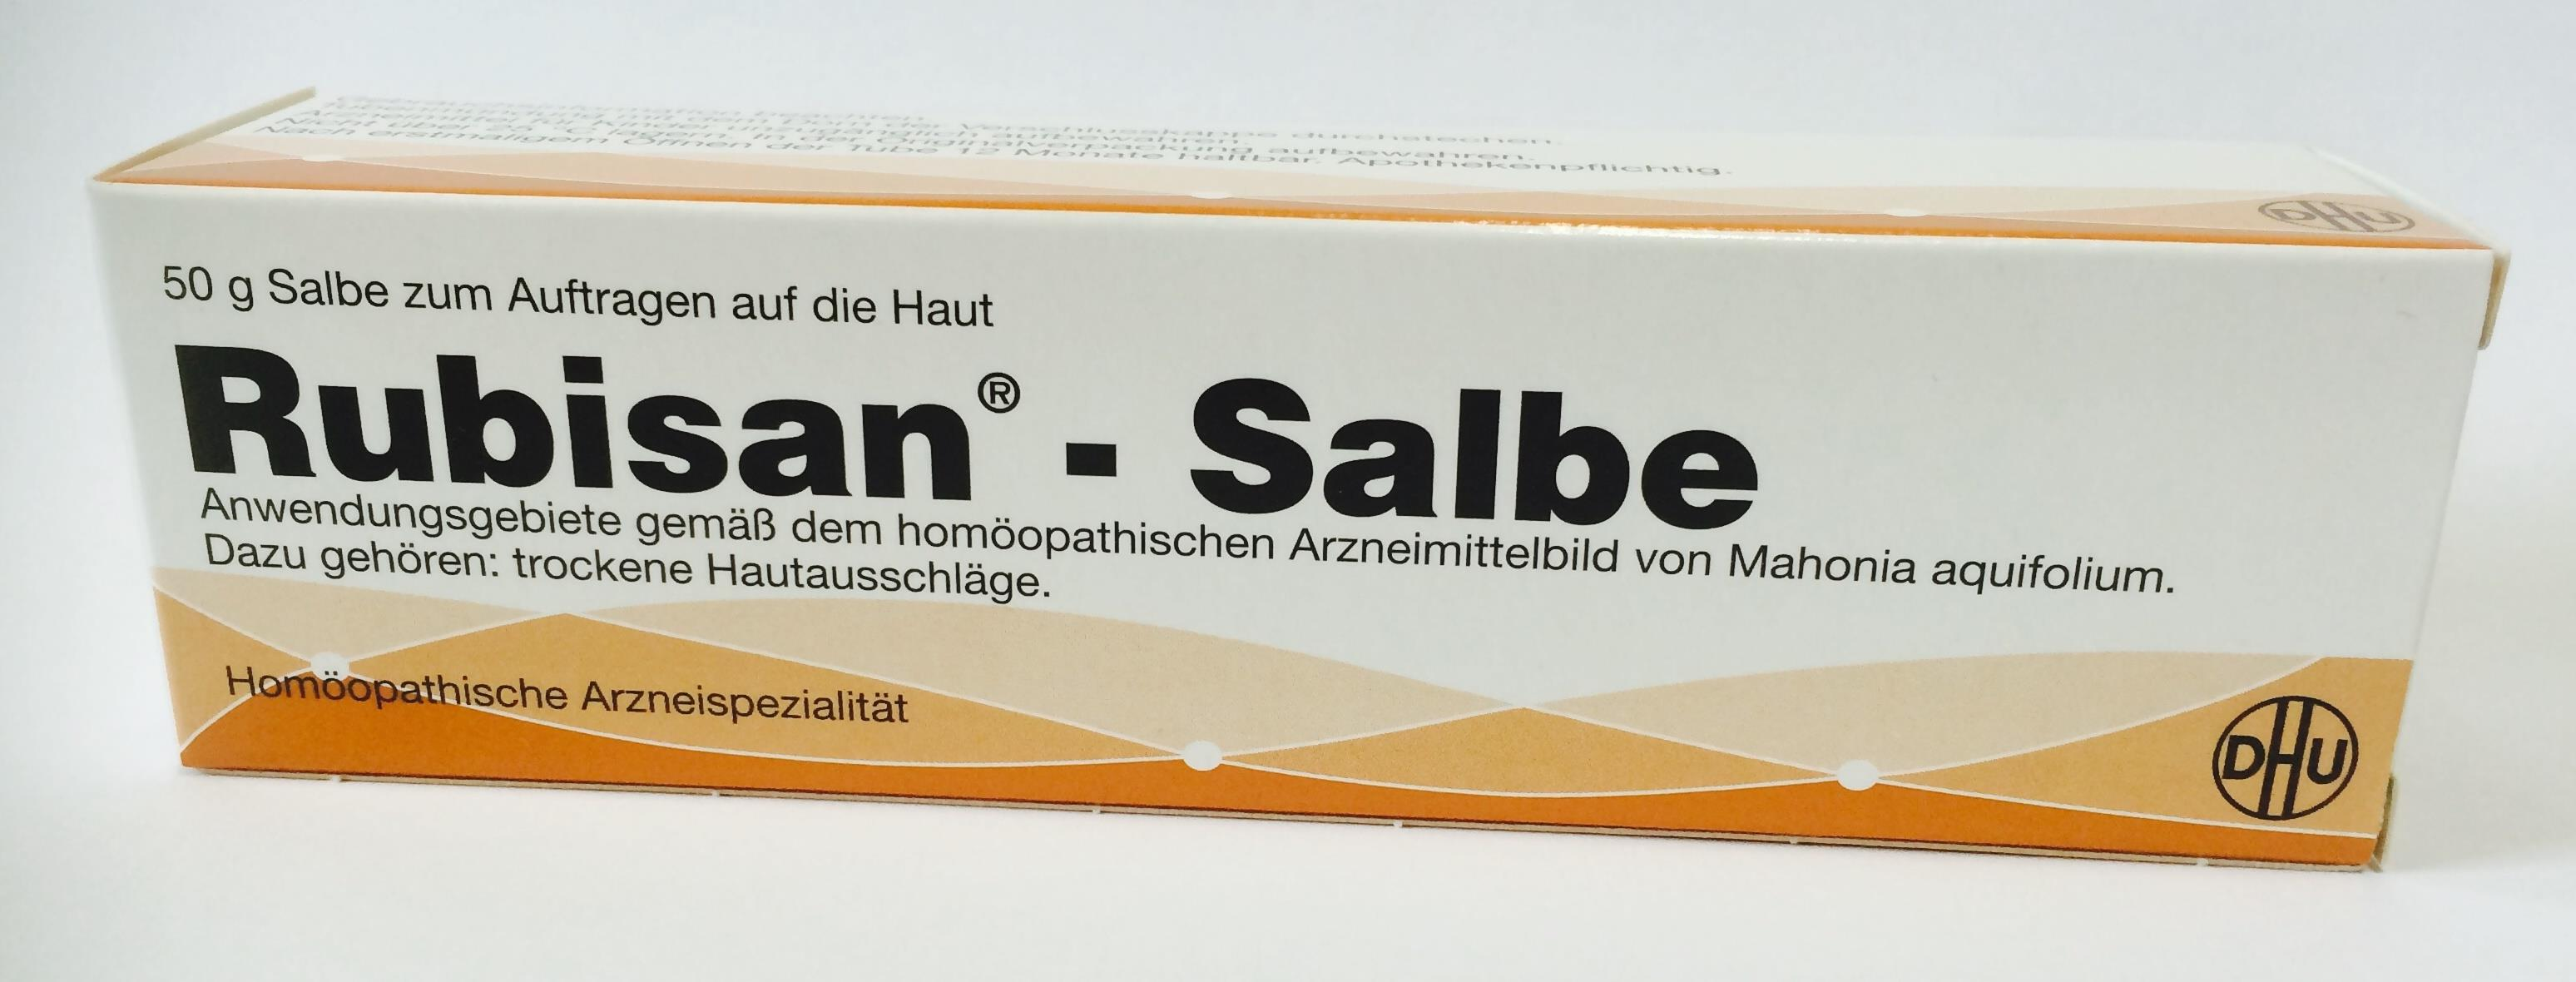 Rubisan - Salbe